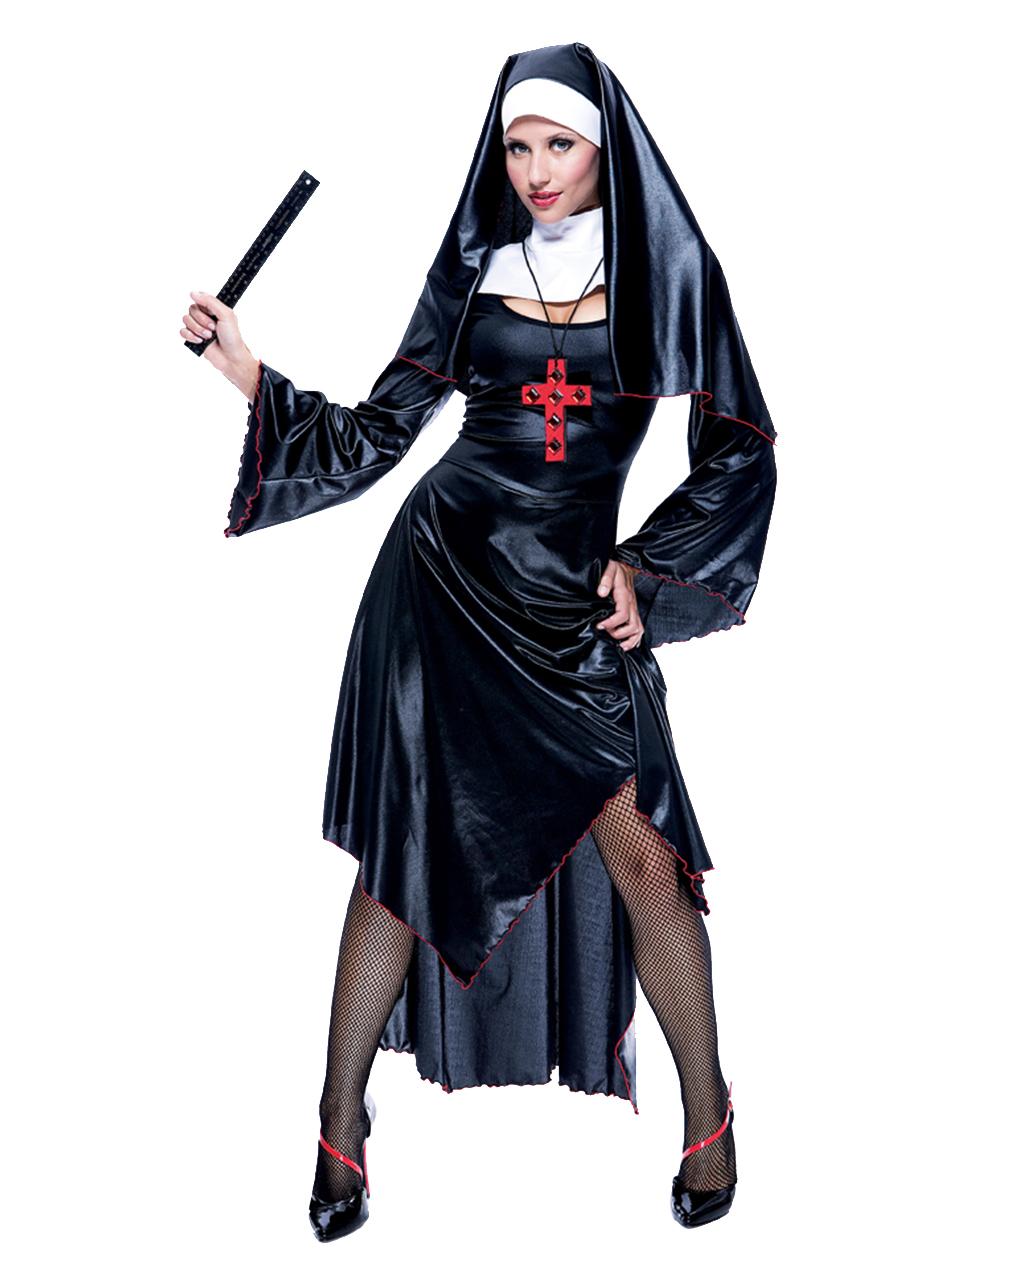 Frivolous Nun Costume  sc 1 st  Horror-Shop.com & Frivolous Nun Costume Sister Costume | horror-shop.com